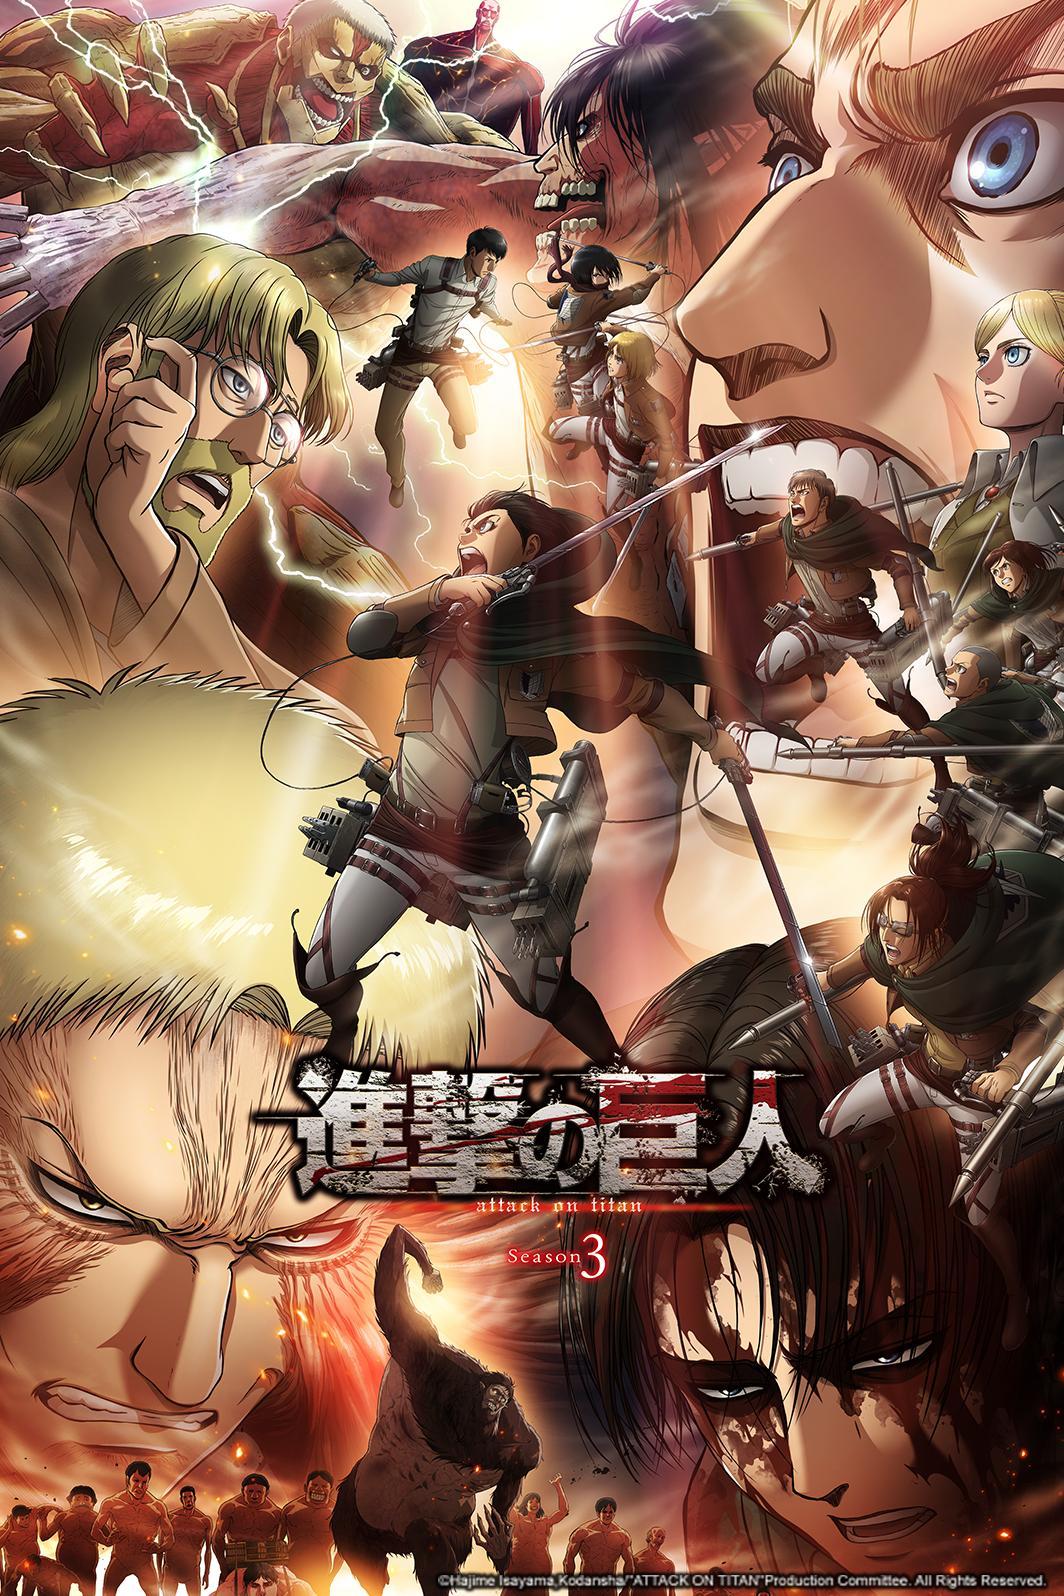 Attack on Titan Reviews - Crunchyroll